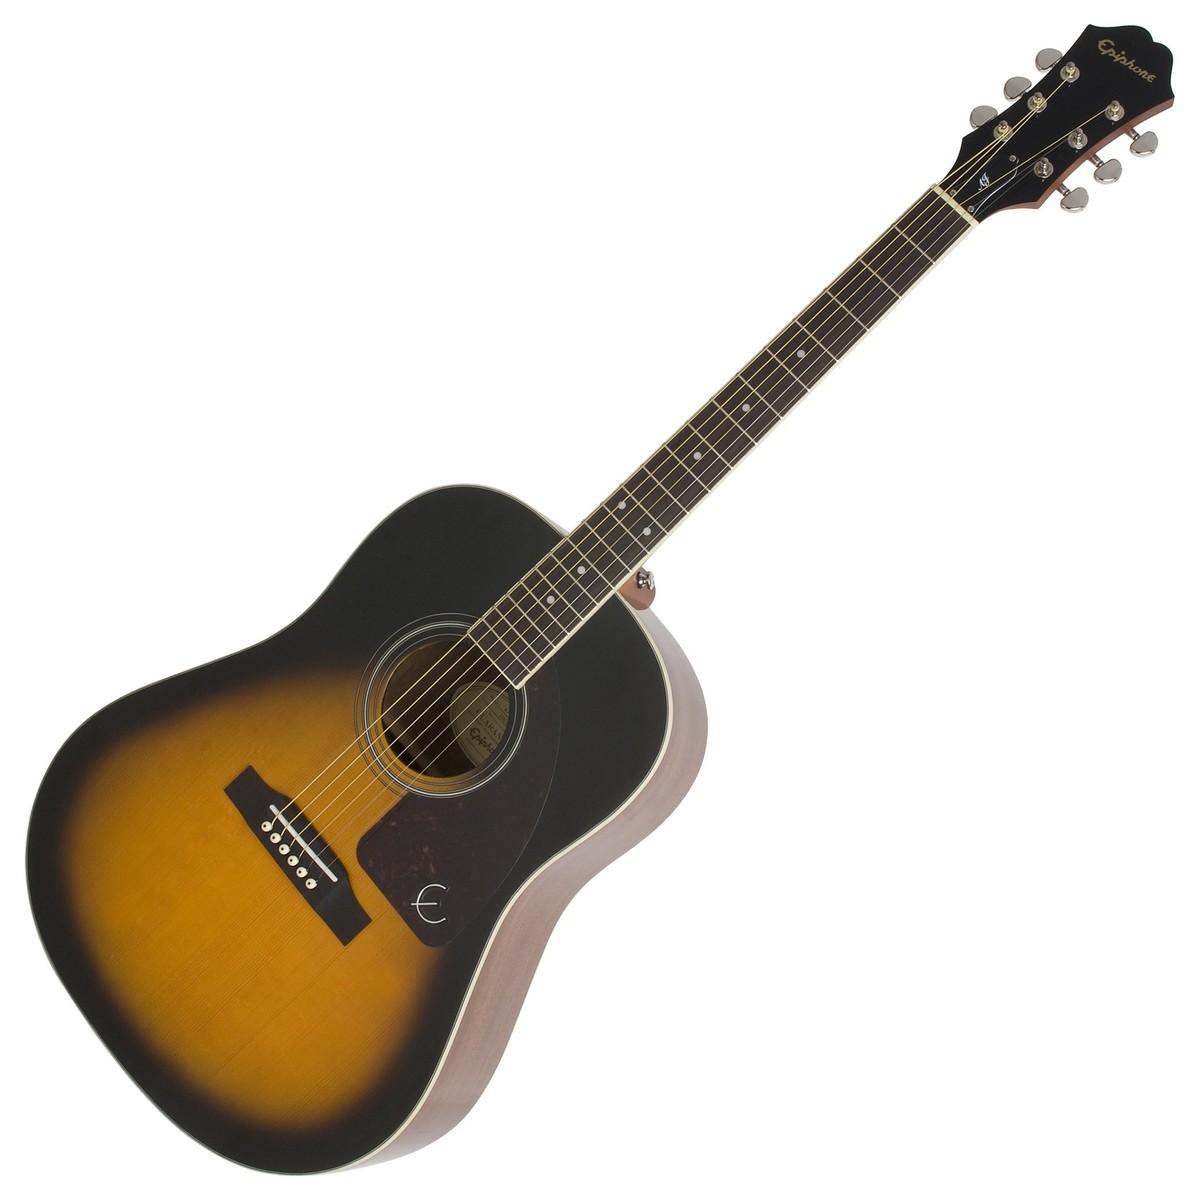 Aj gibson dating guitars